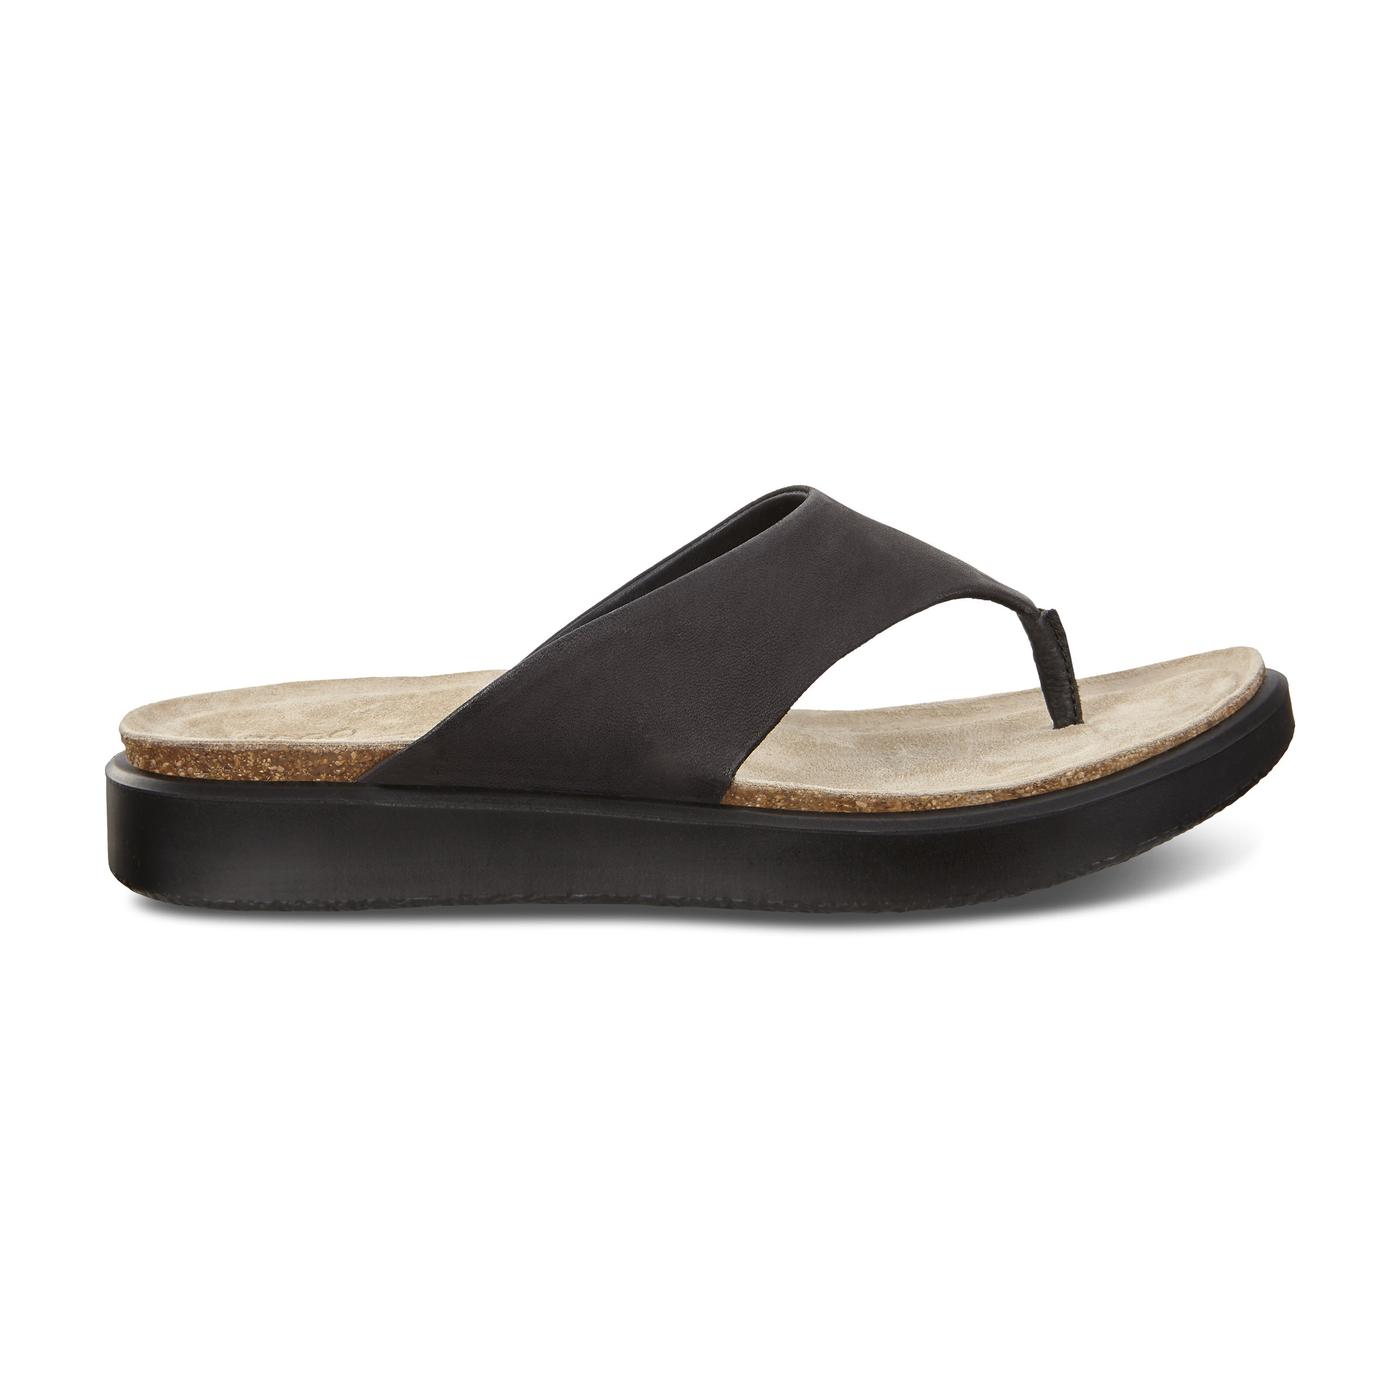 ECCO CORKSPHERE Women's Thong Sandal